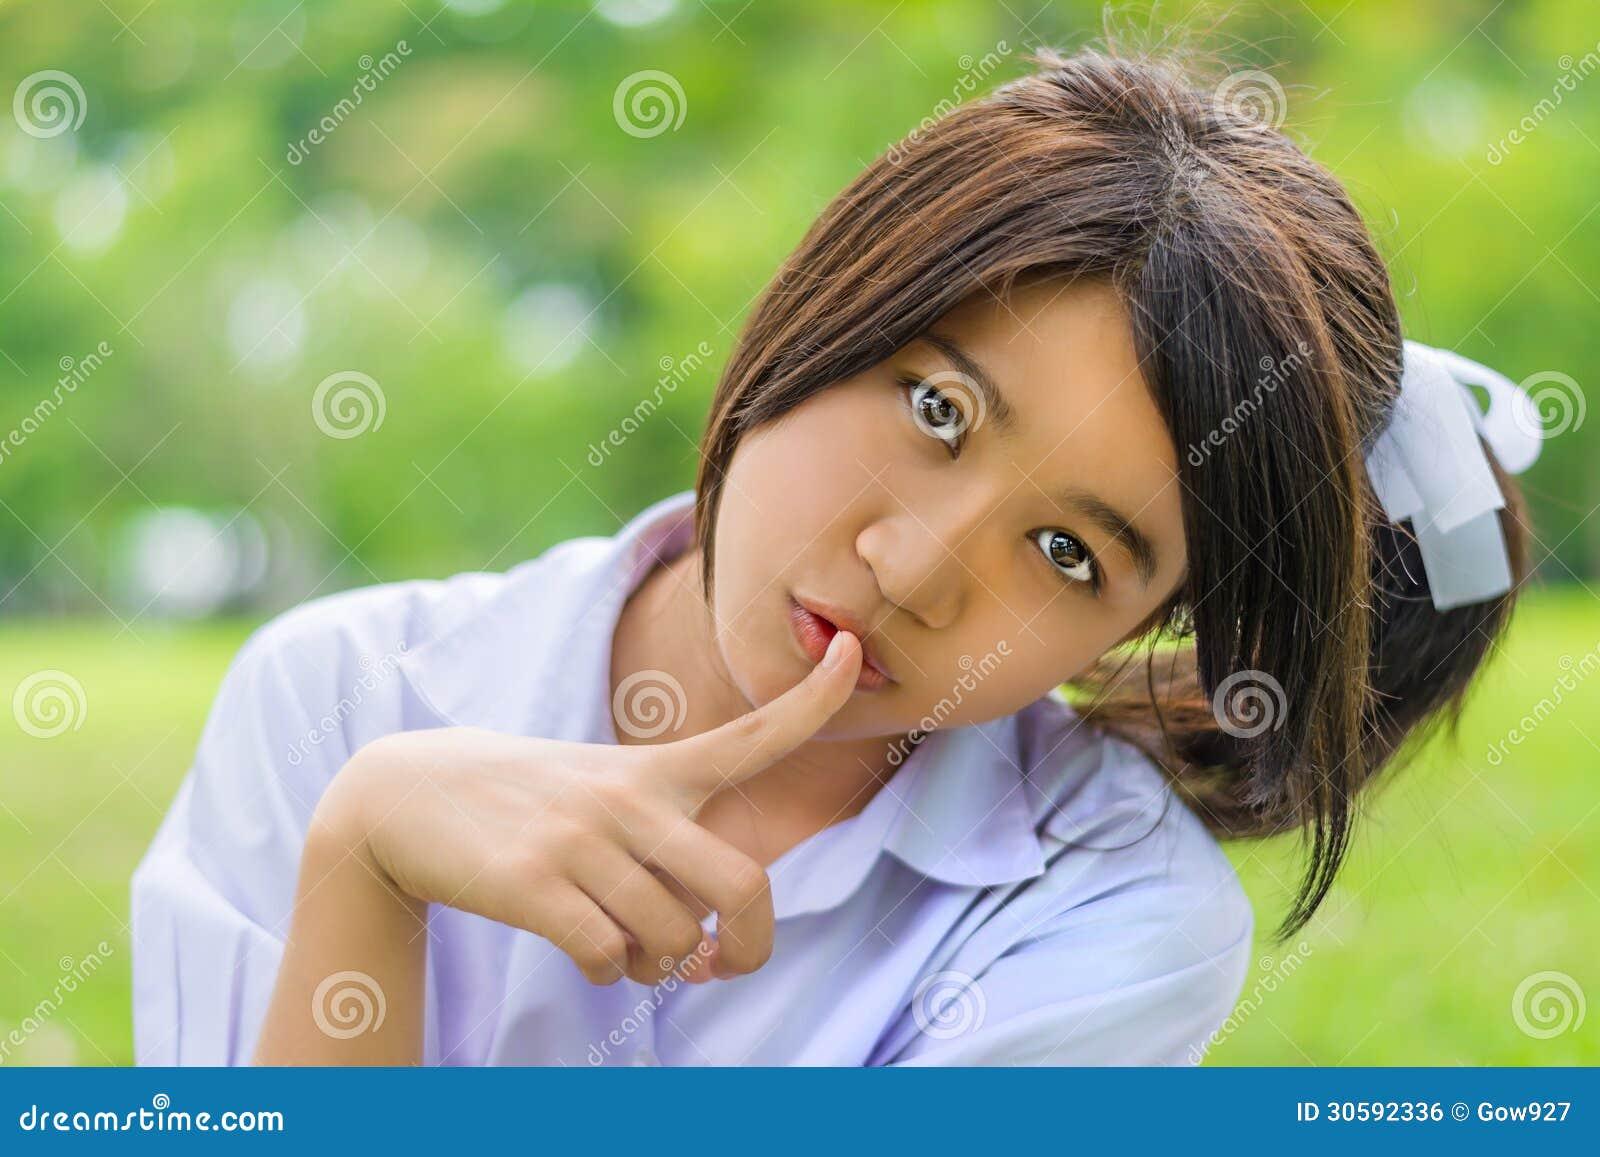 Cute thai schoolgirl hush gesture royalty free stock for 15 year old girl cute